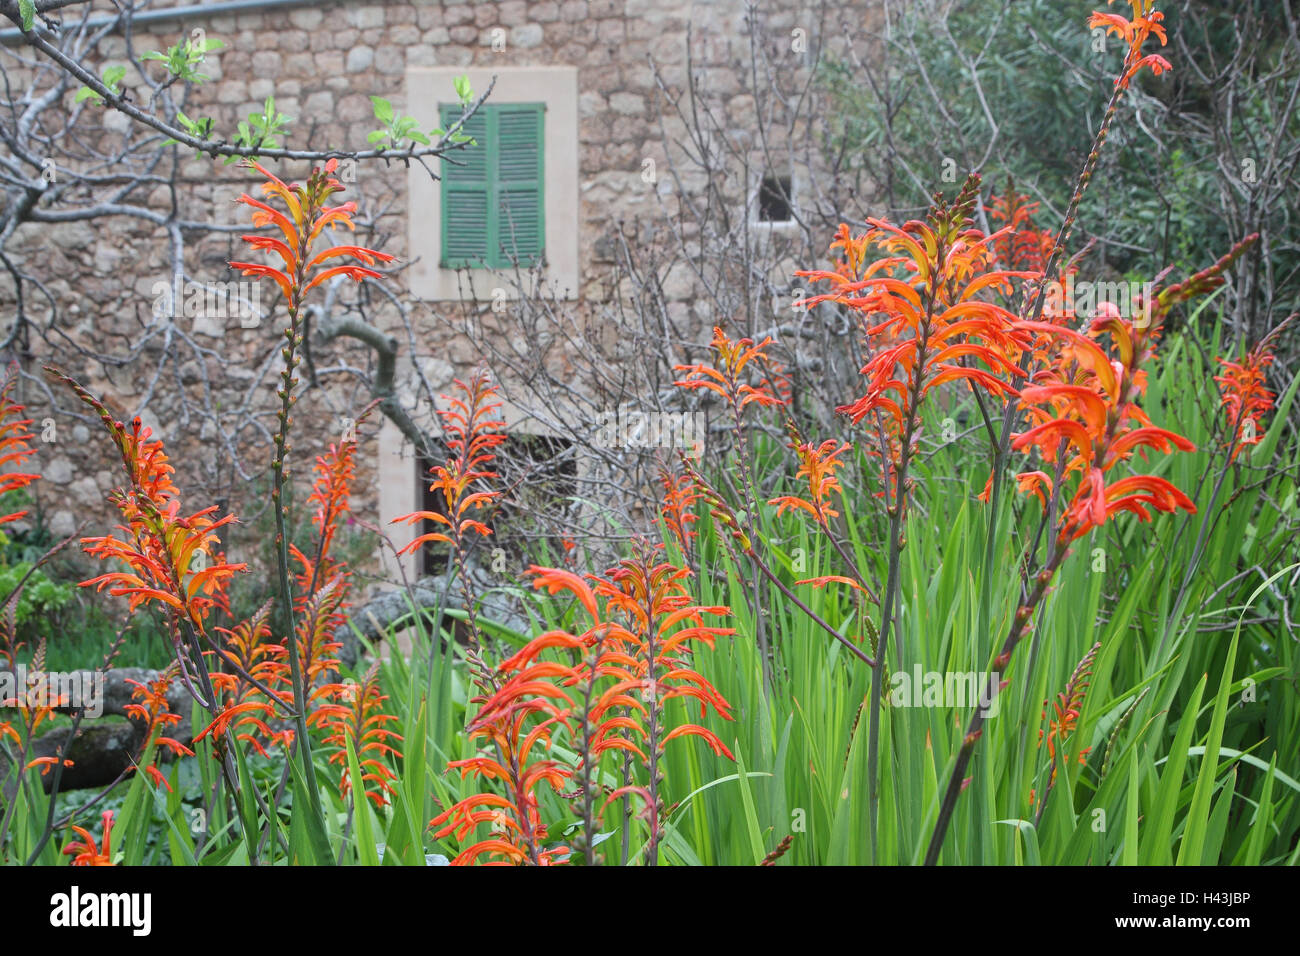 Mallorca Cala de Deia Hausfassade Garten Blumen